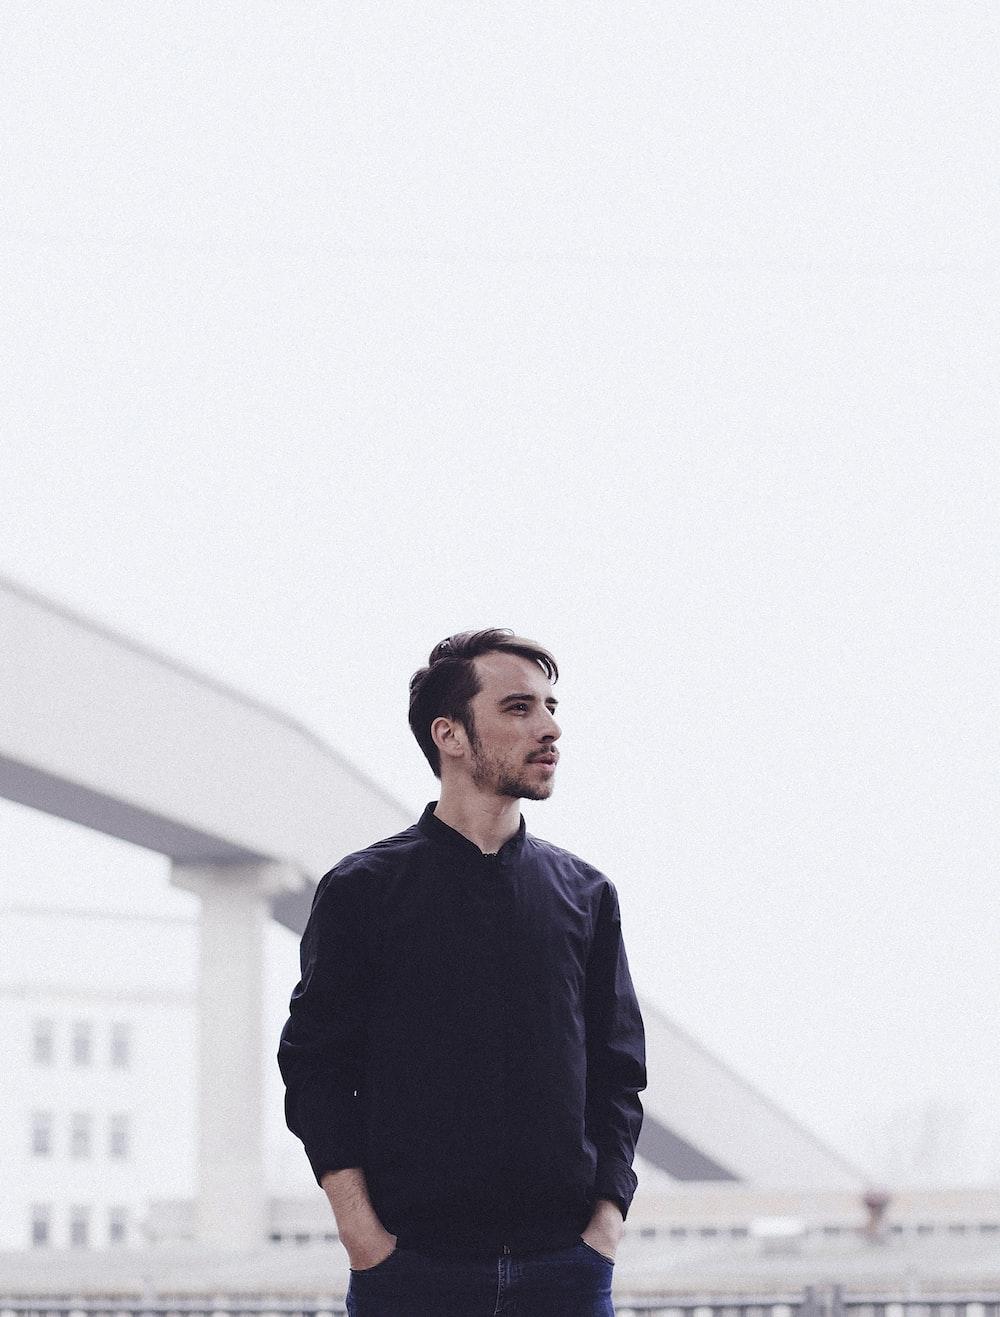 shallow focus photo of man in black dress shirt